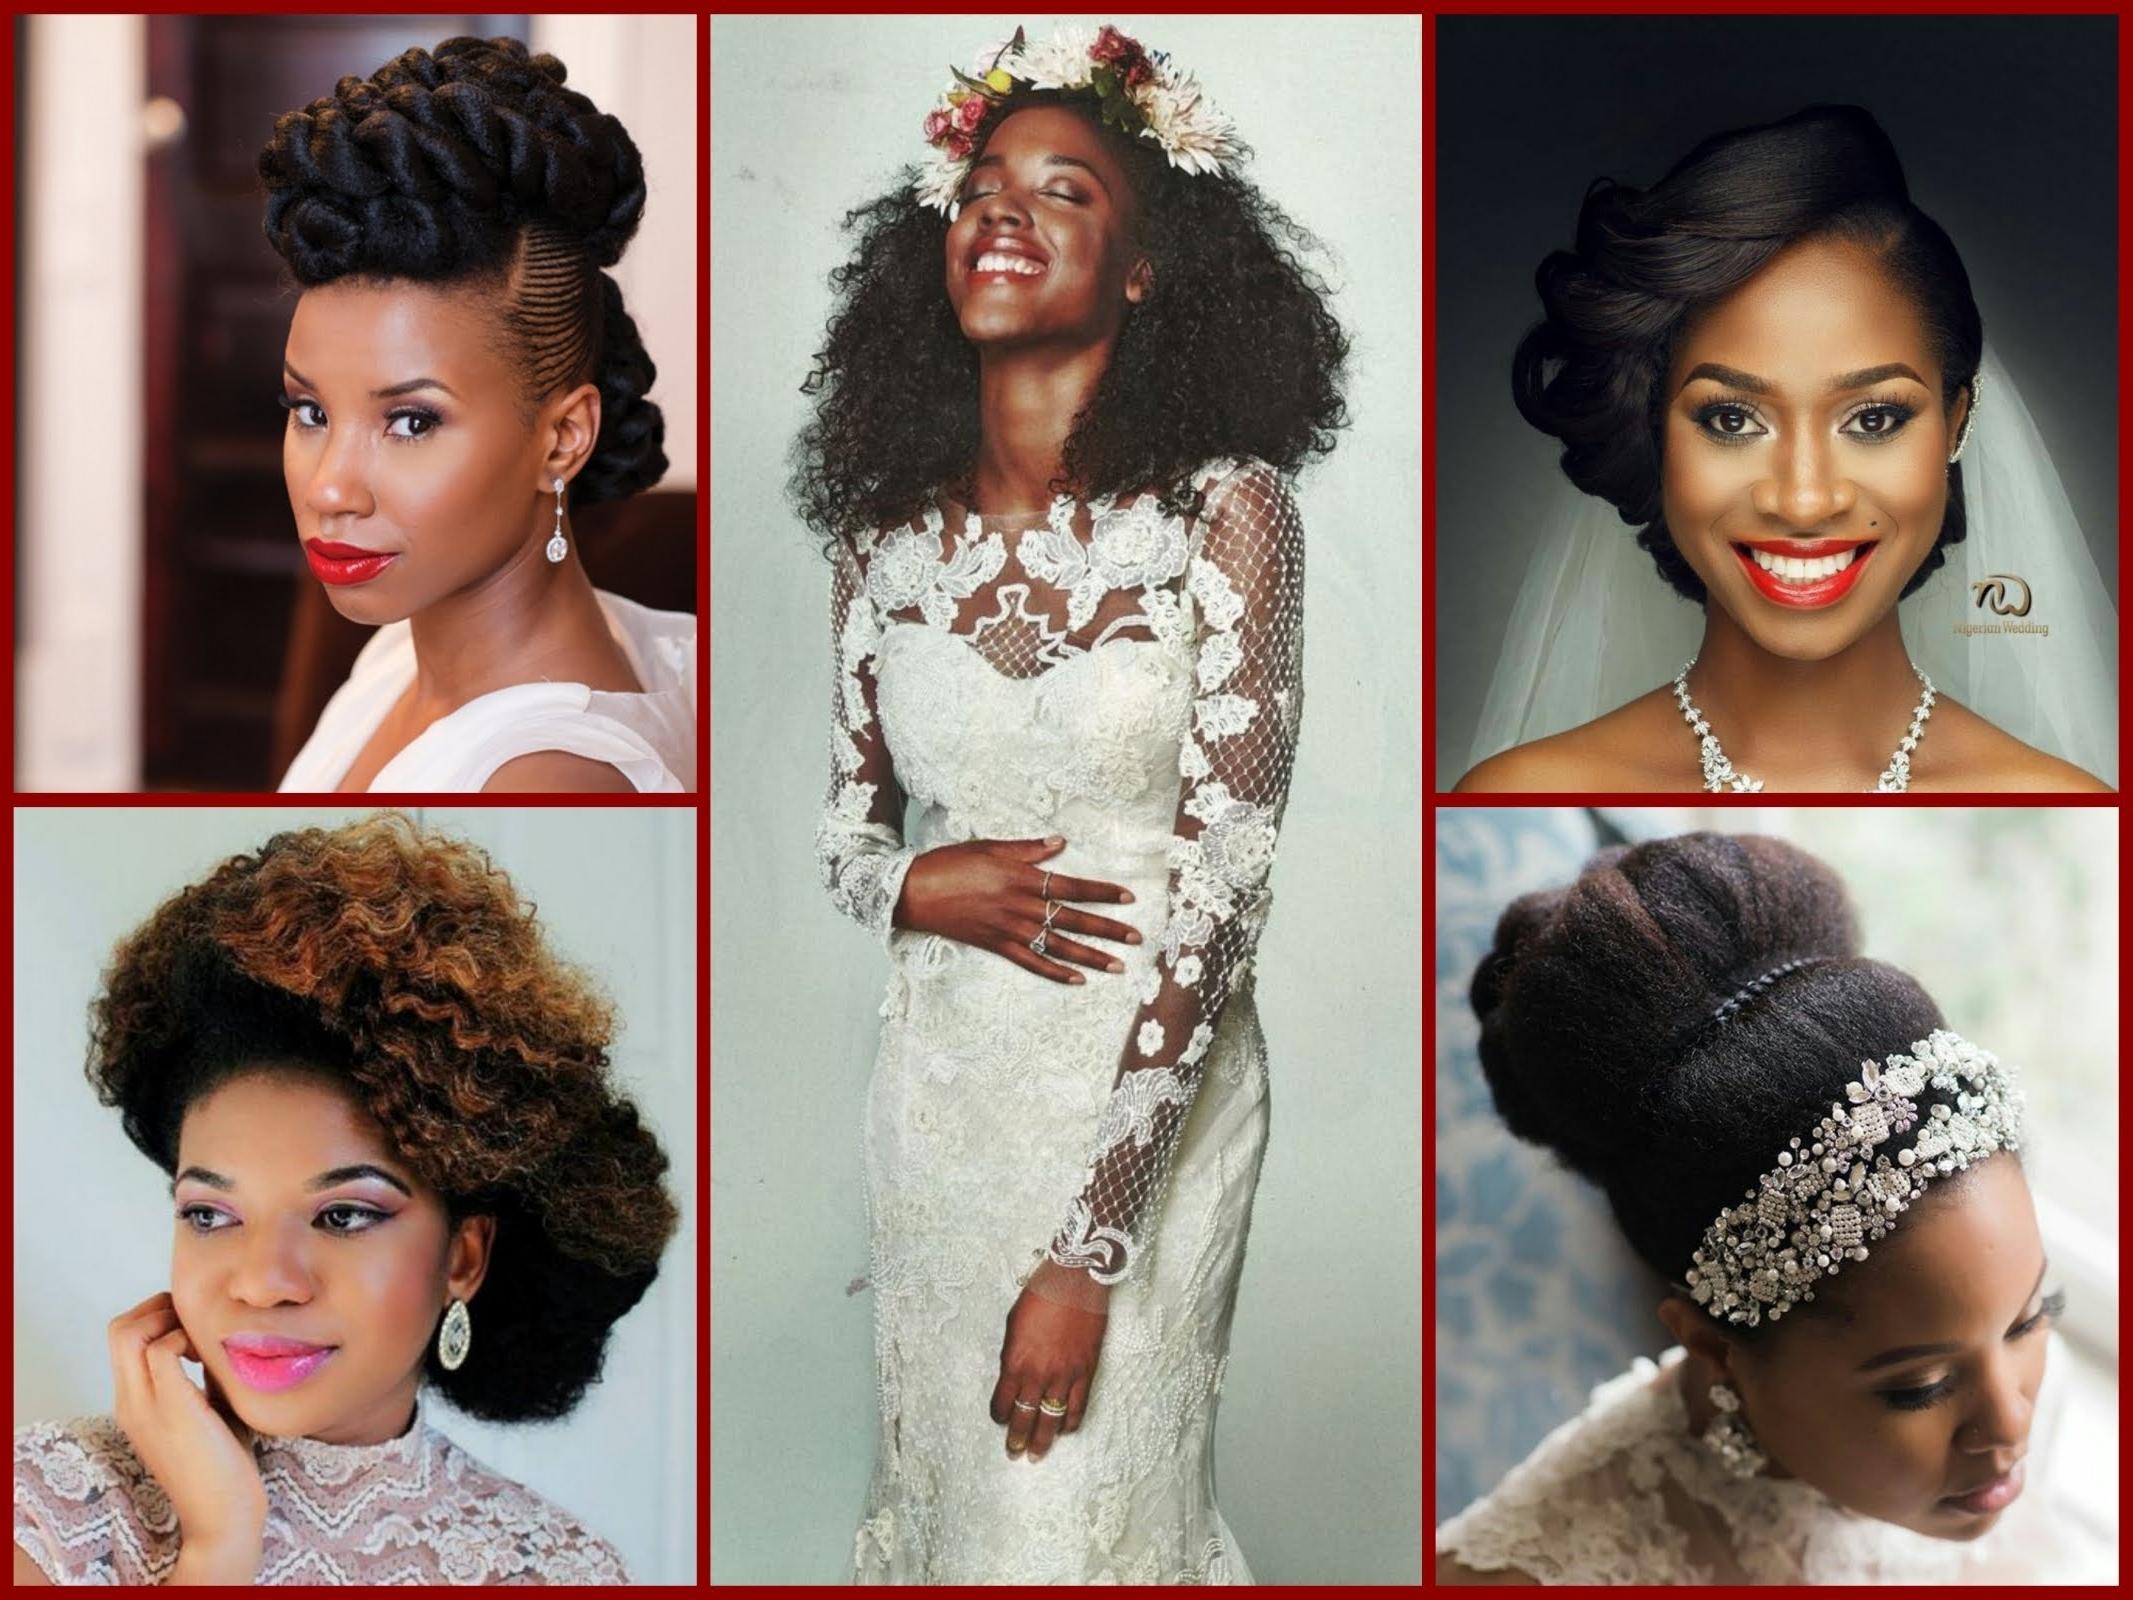 Black Women Wedding Hairstyles – 40 Beautiful Updos – Youtube In Black Bride Updo Hairstyles (View 6 of 15)